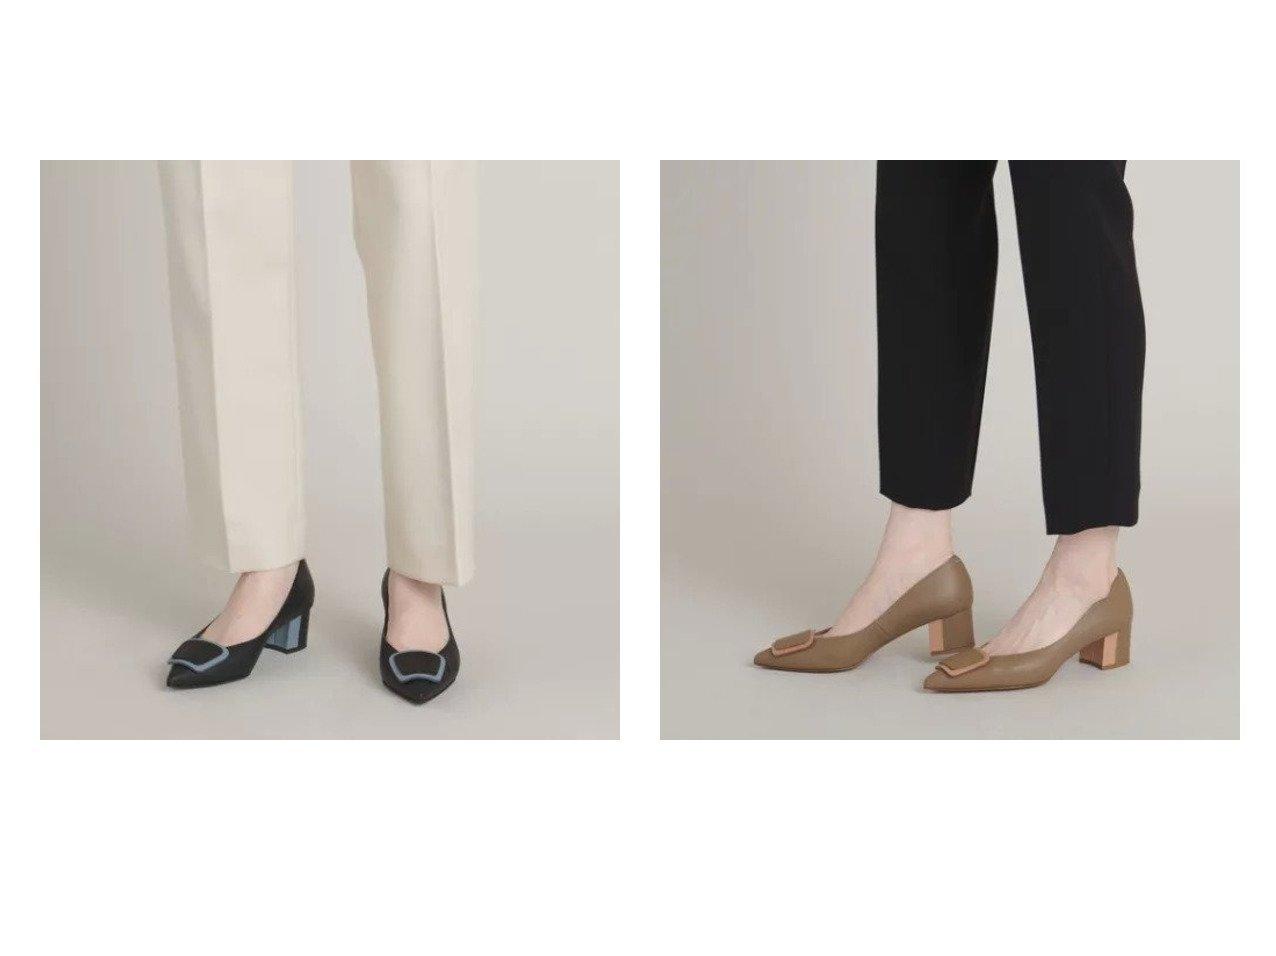 【Odette e Odile/オデット エ オディール】のレザーオーナメント パンプス45↓↑ 【シューズ・靴】おすすめ!人気、トレンド・レディースファッションの通販 おすすめで人気の流行・トレンド、ファッションの通販商品 インテリア・家具・メンズファッション・キッズファッション・レディースファッション・服の通販 founy(ファニー) https://founy.com/ ファッション Fashion レディースファッション WOMEN コンビ シューズ フェミニン |ID:crp329100000063749